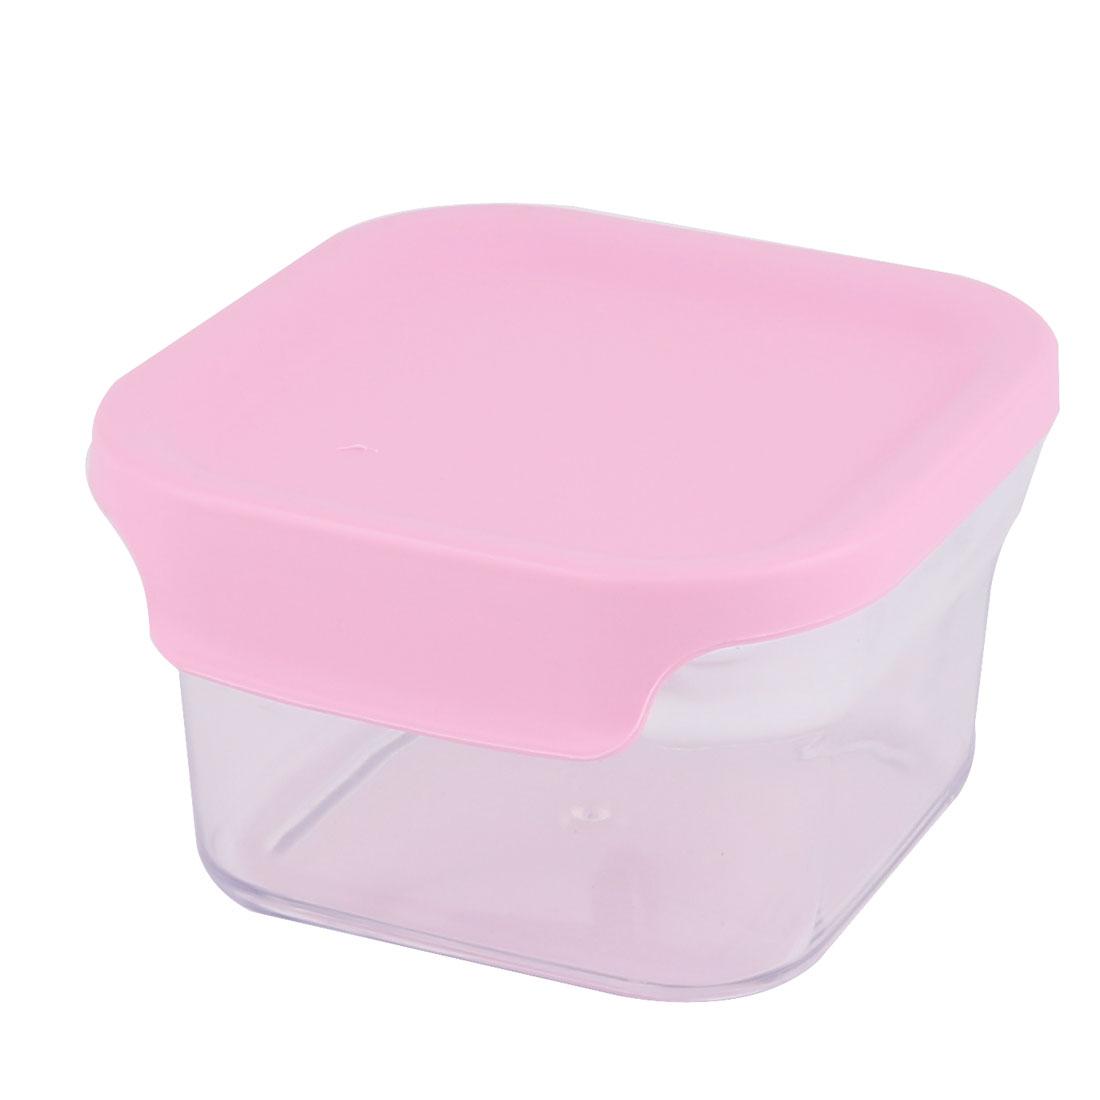 Hiking Travel Plastic Airtight Food Cheese Snacks Storage Box Holder Pink 400ML